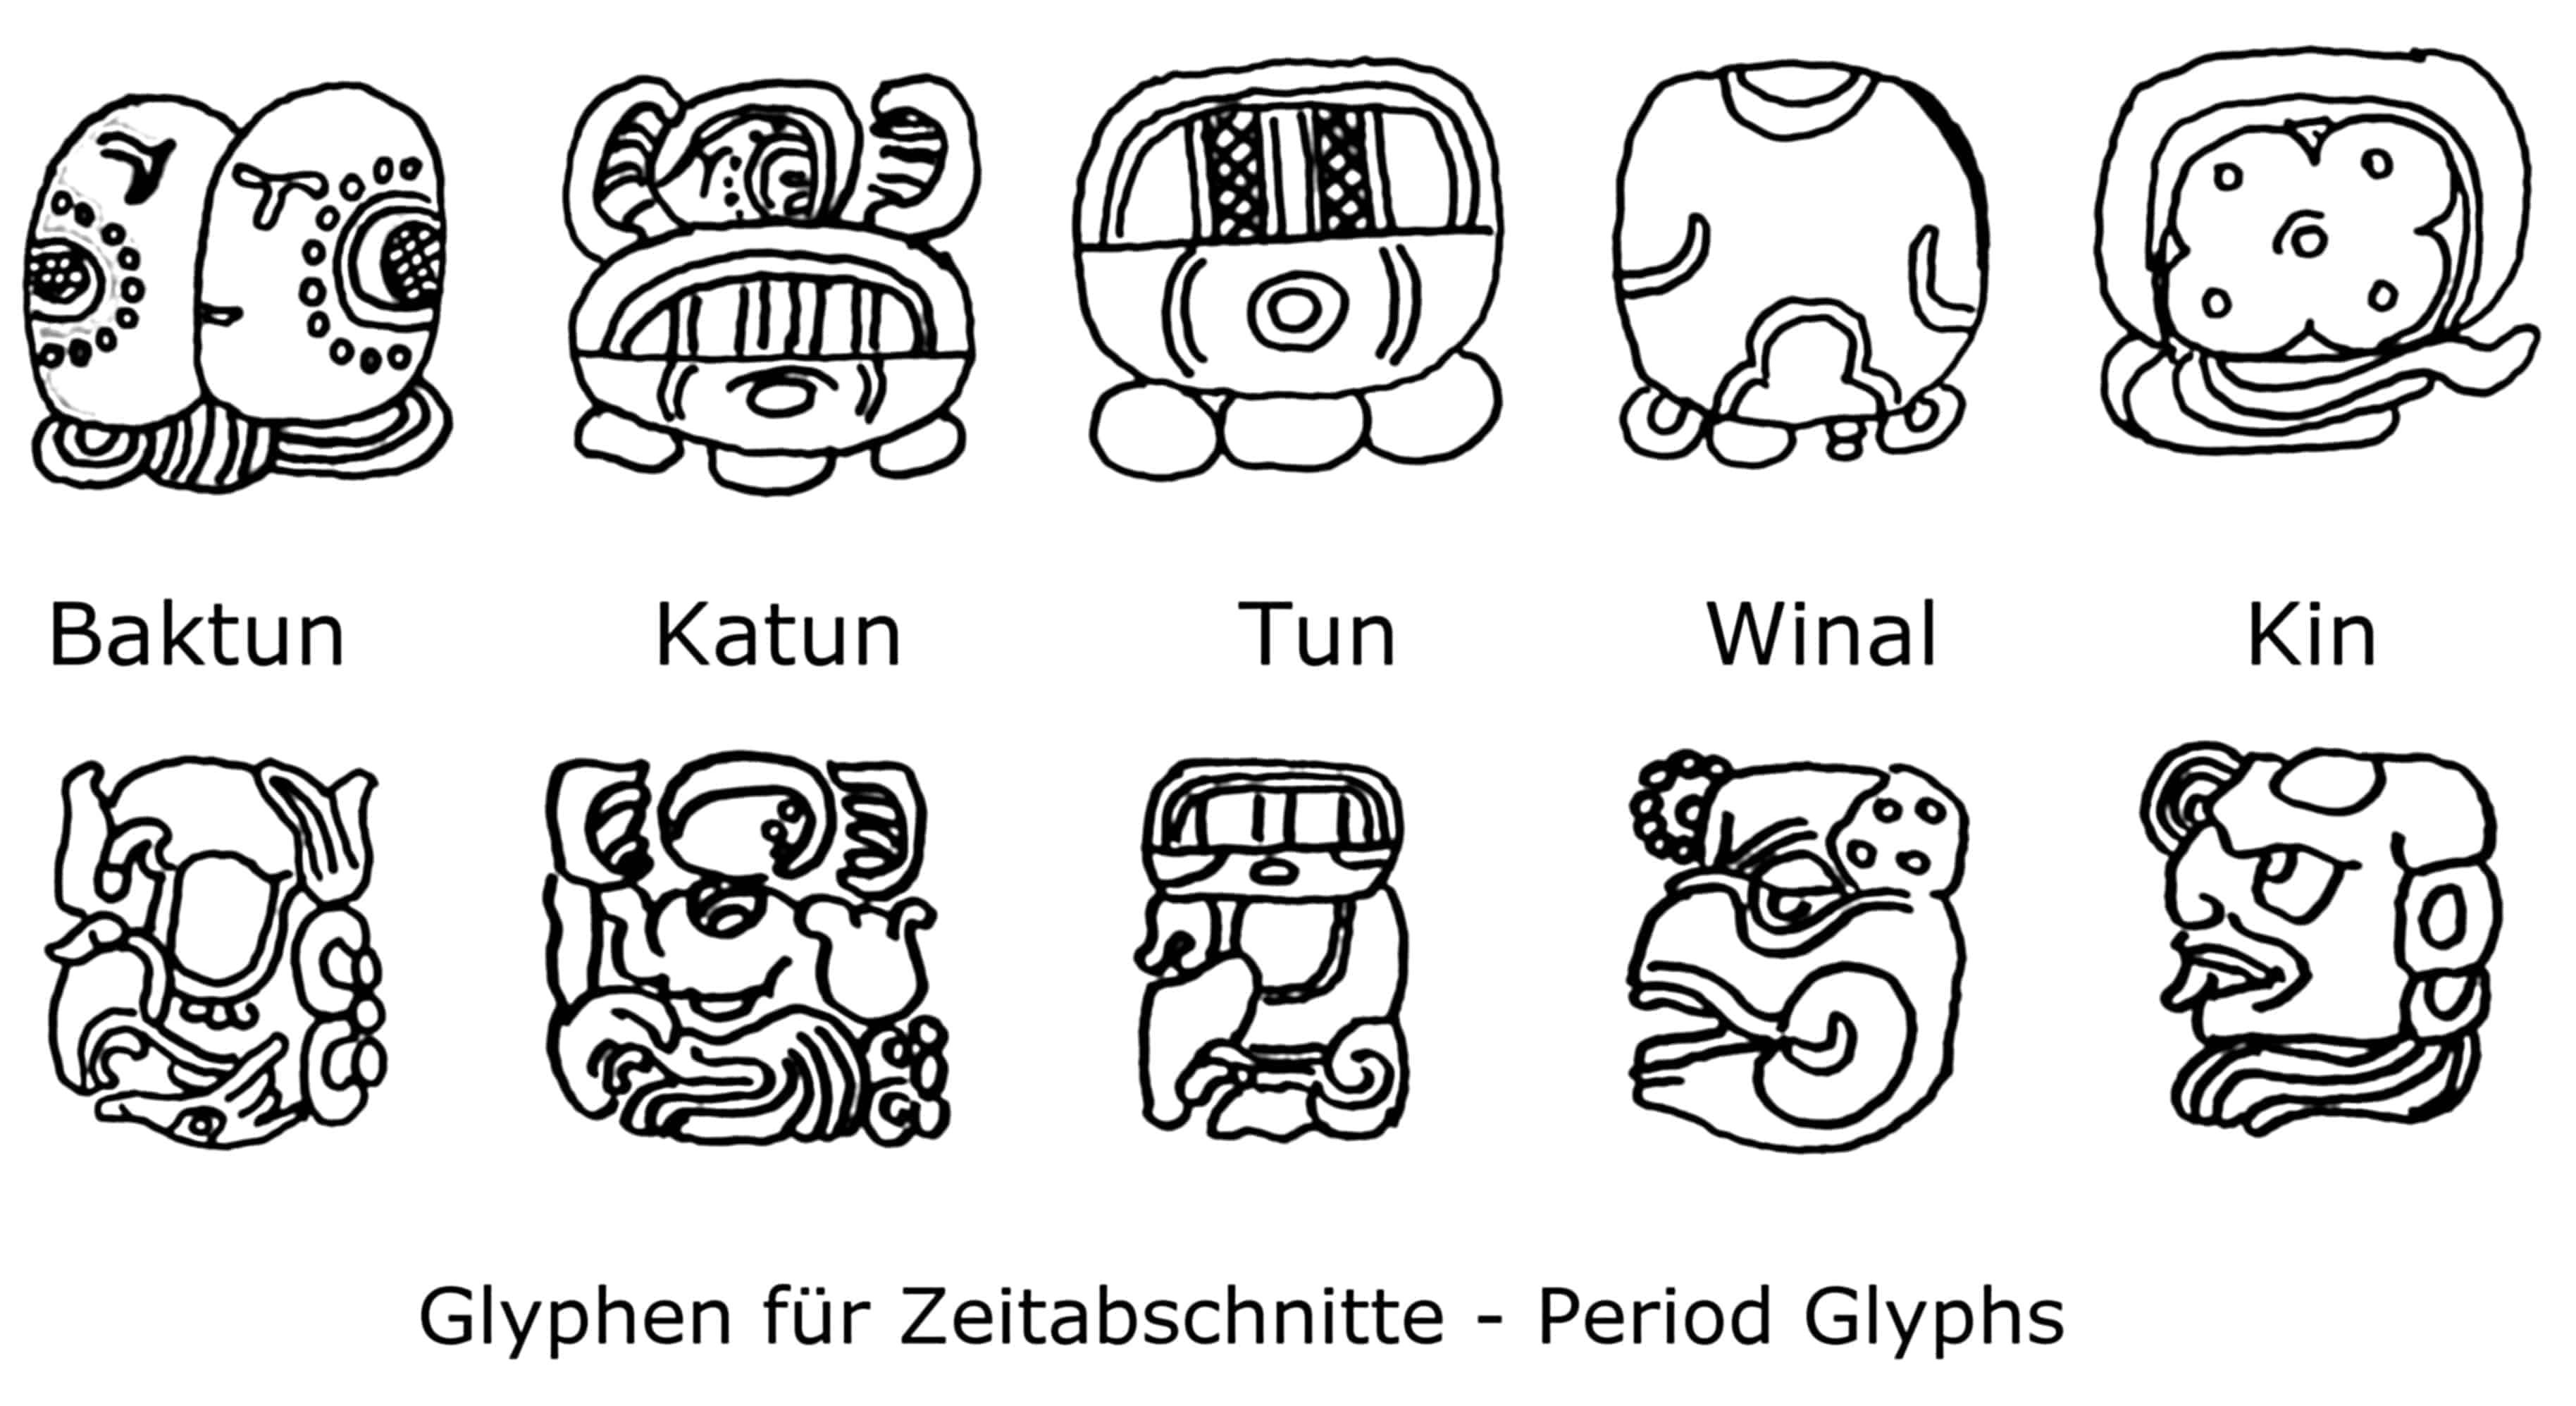 The Maya Calendar Part 5 The Long Count Of The Maya Inscriptions